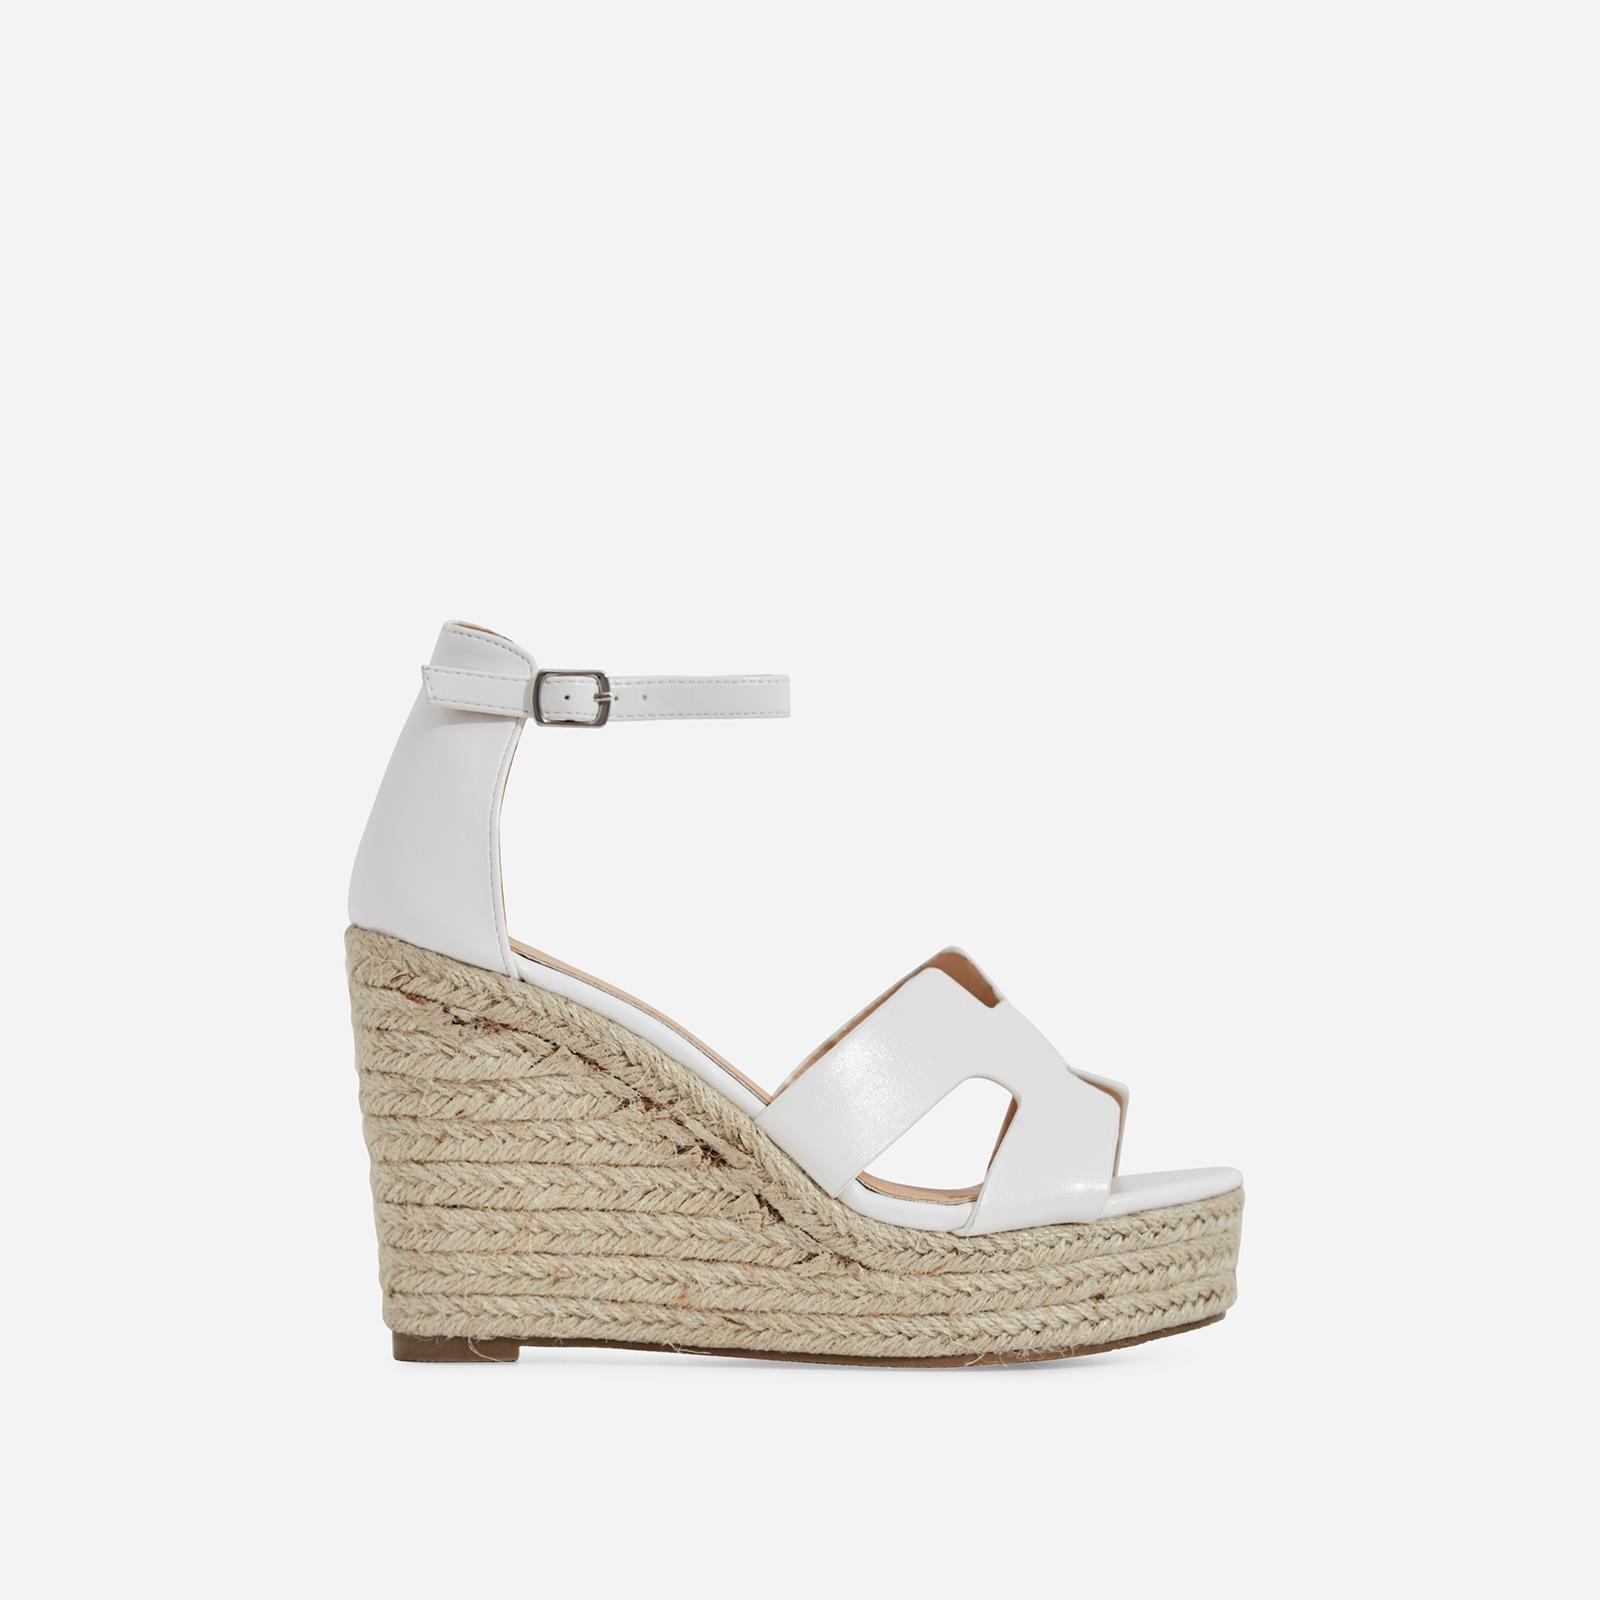 Kayson Platform Espadrille Wedge Block Heel In White Faux Leather